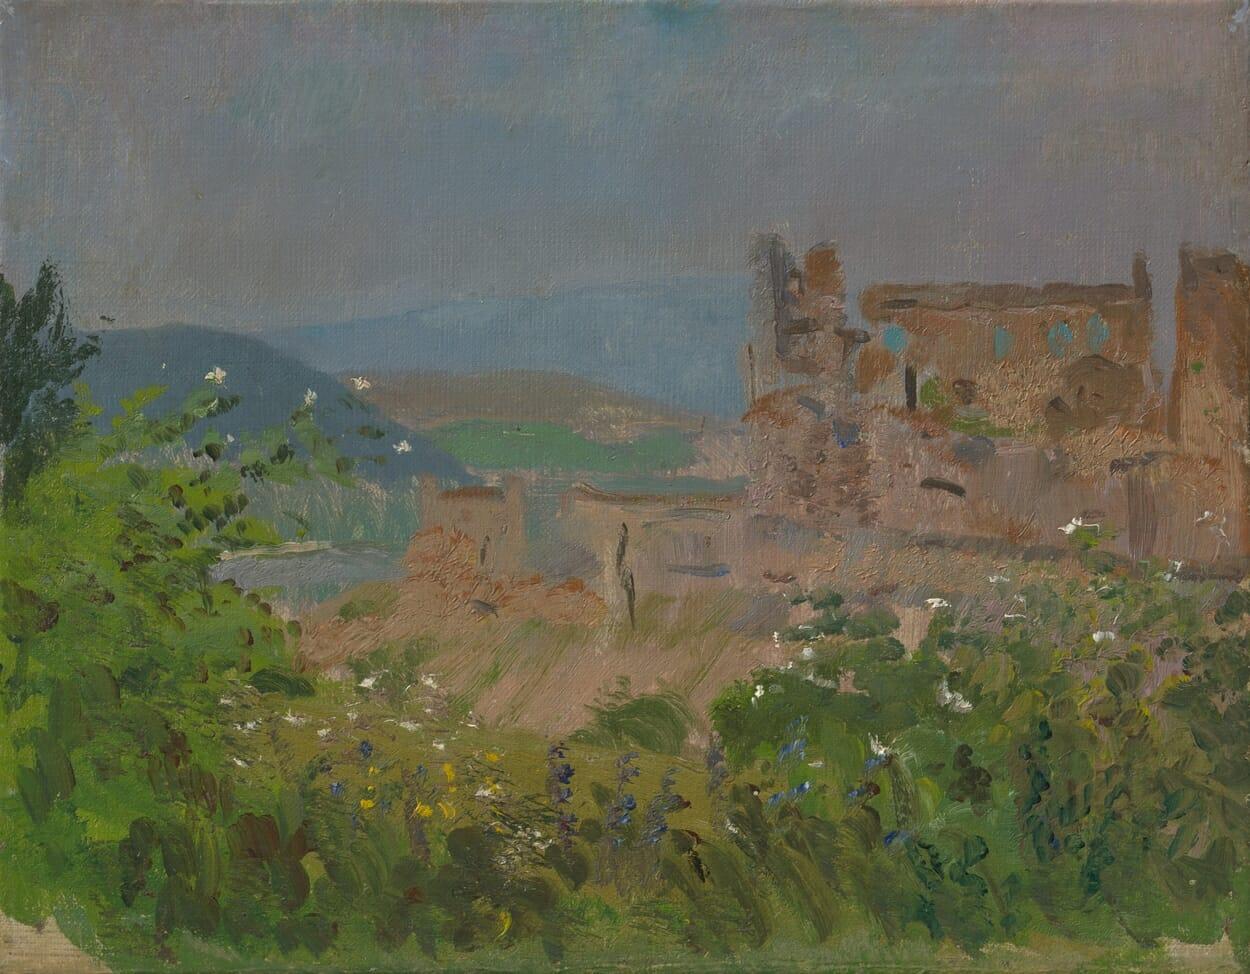 Olejomaľba: Beckovský hrad, Ladislav Mednyánszky, 1880–1885, SNG